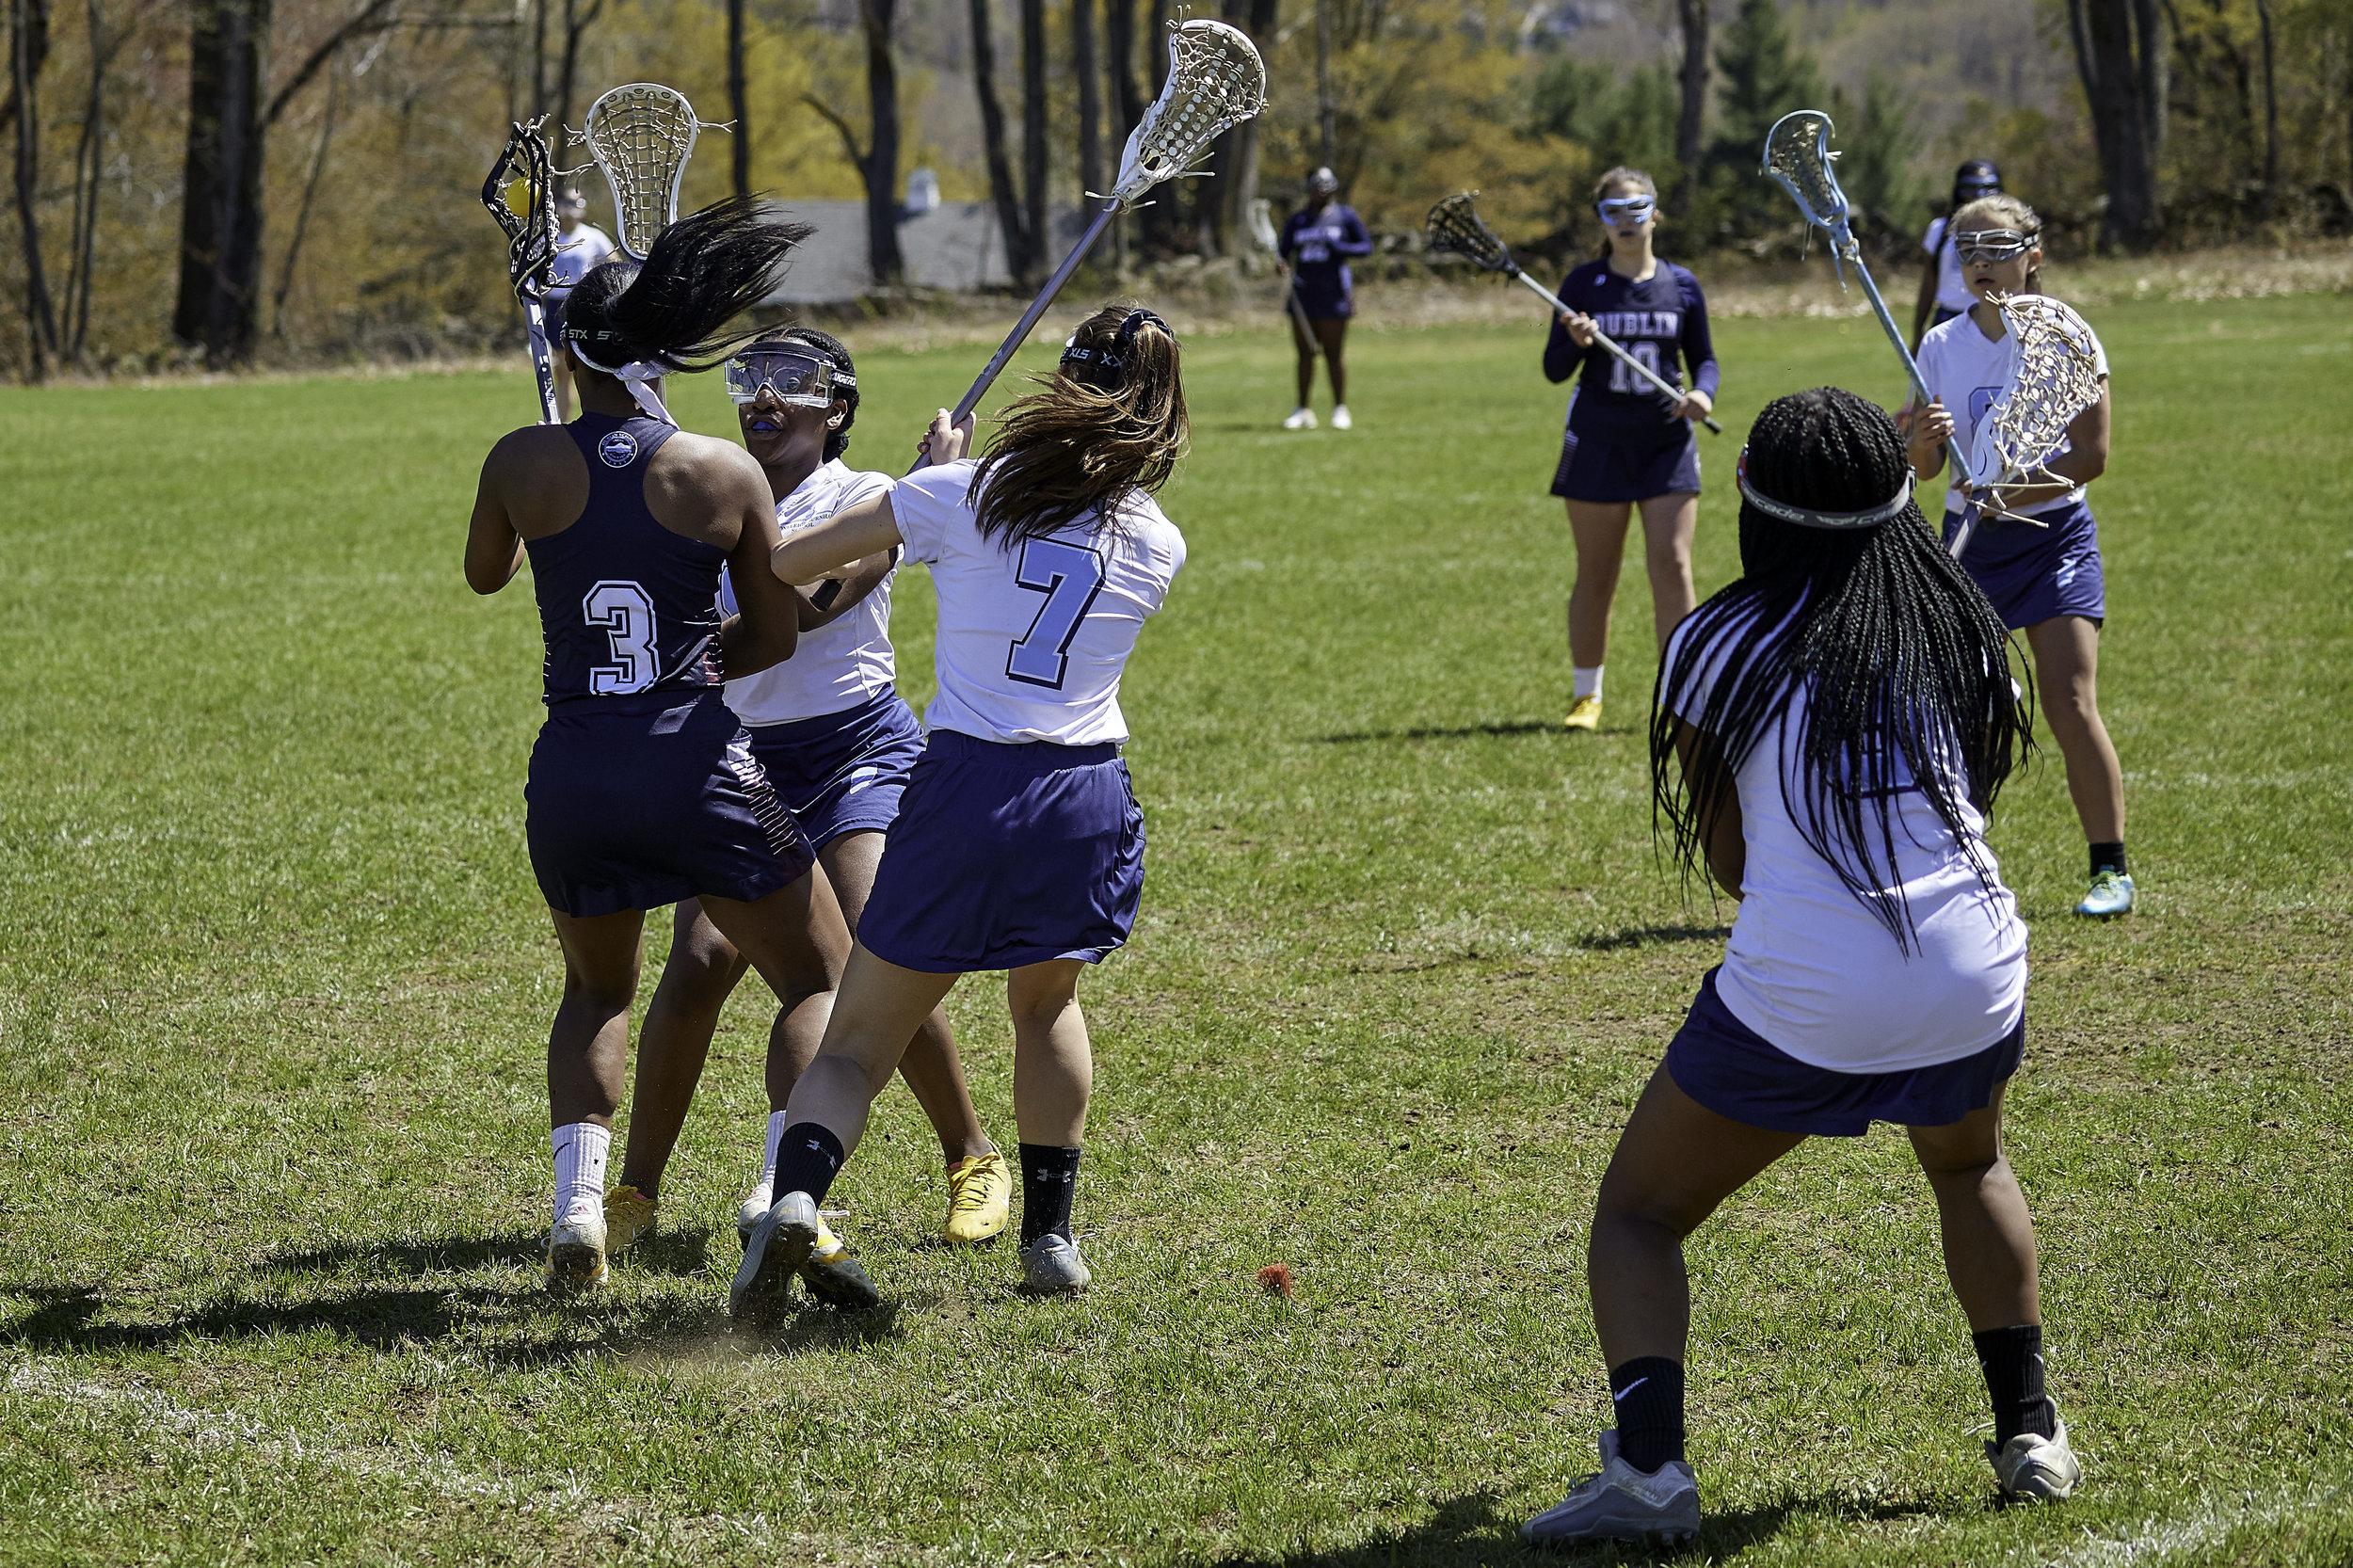 Girls Lacrosse vs. Stoneleigh Burnham School - May 11, 2019 - May 10, 2019193242.jpg